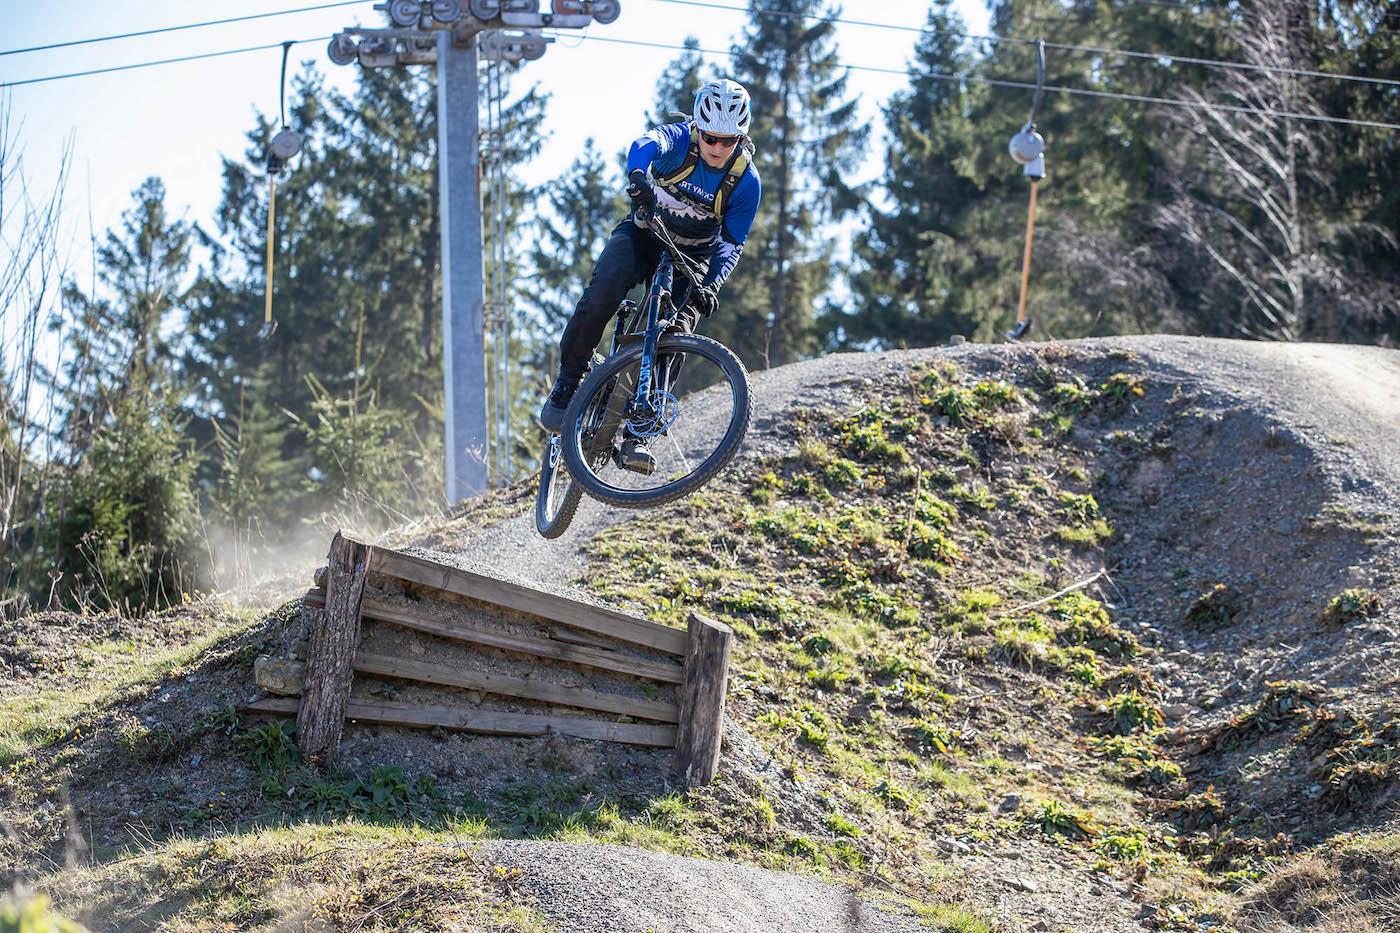 MTB Sprung & Drop Kurs in Bad Salzdetfurth Hannover - Fahrtechnik Training Rock my Trail Bikeschule